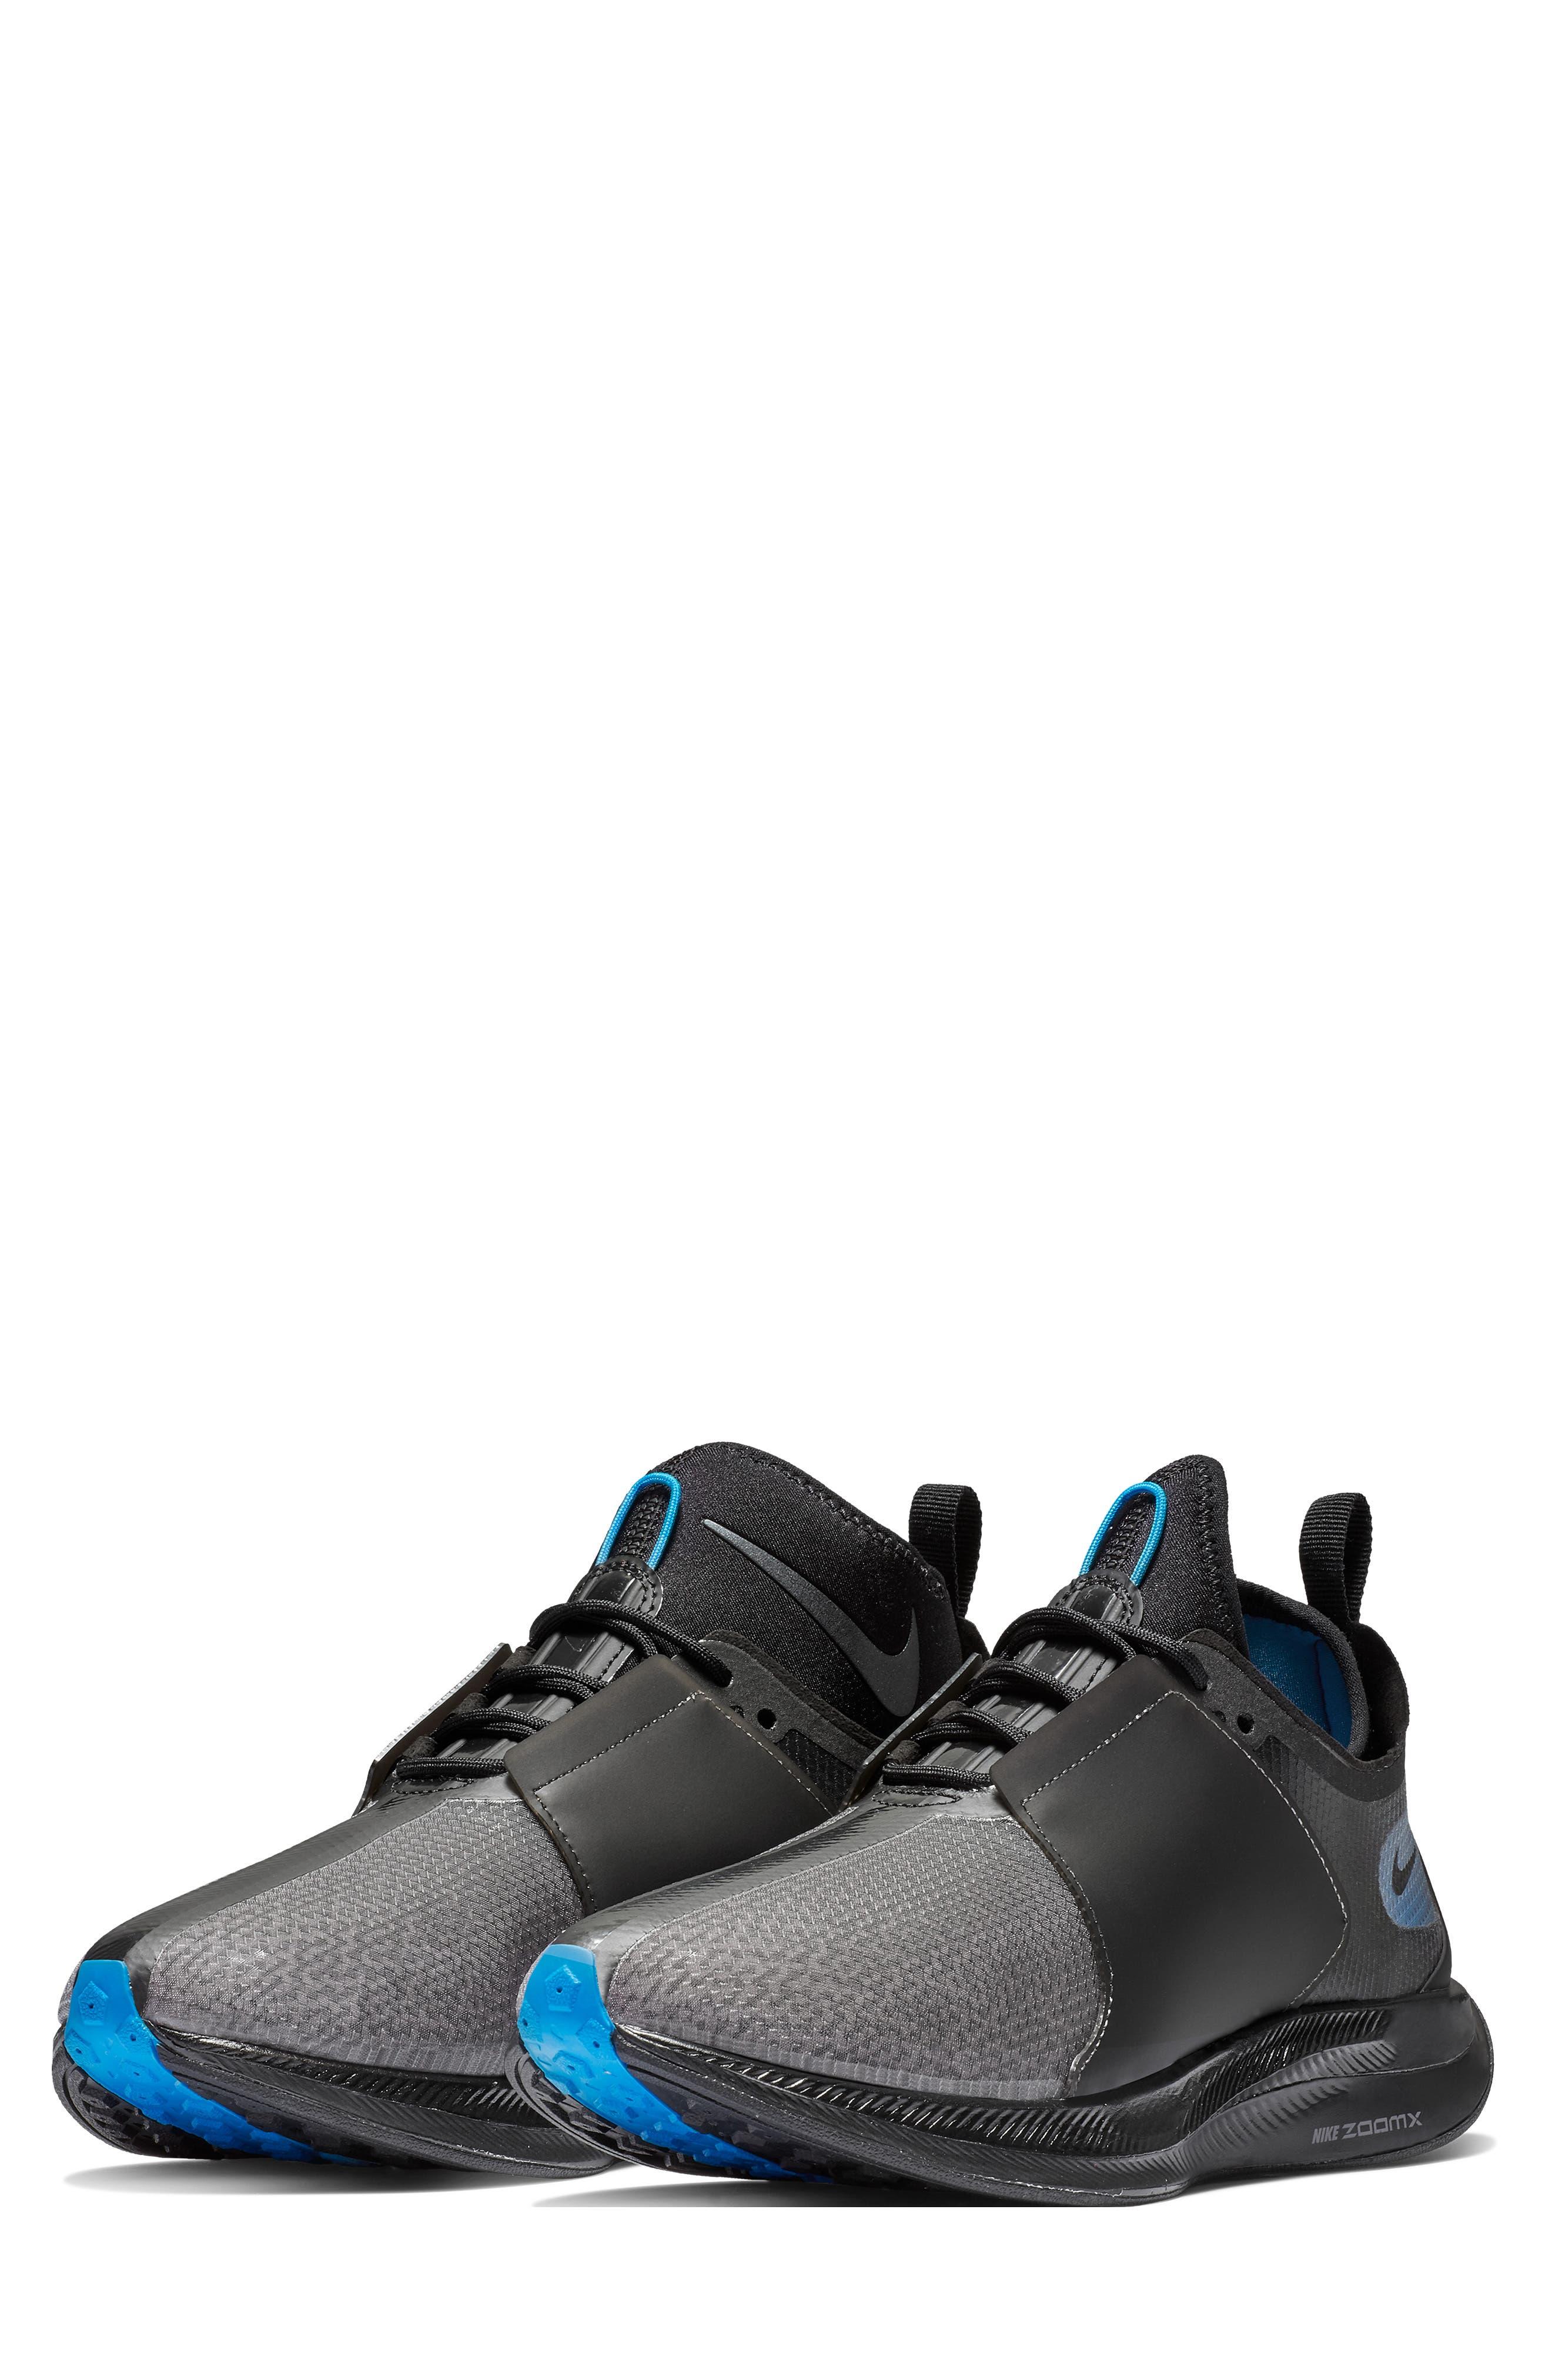 NIKE Zoom Pegasus Turbo XX Running Shoe, Main, color, 004